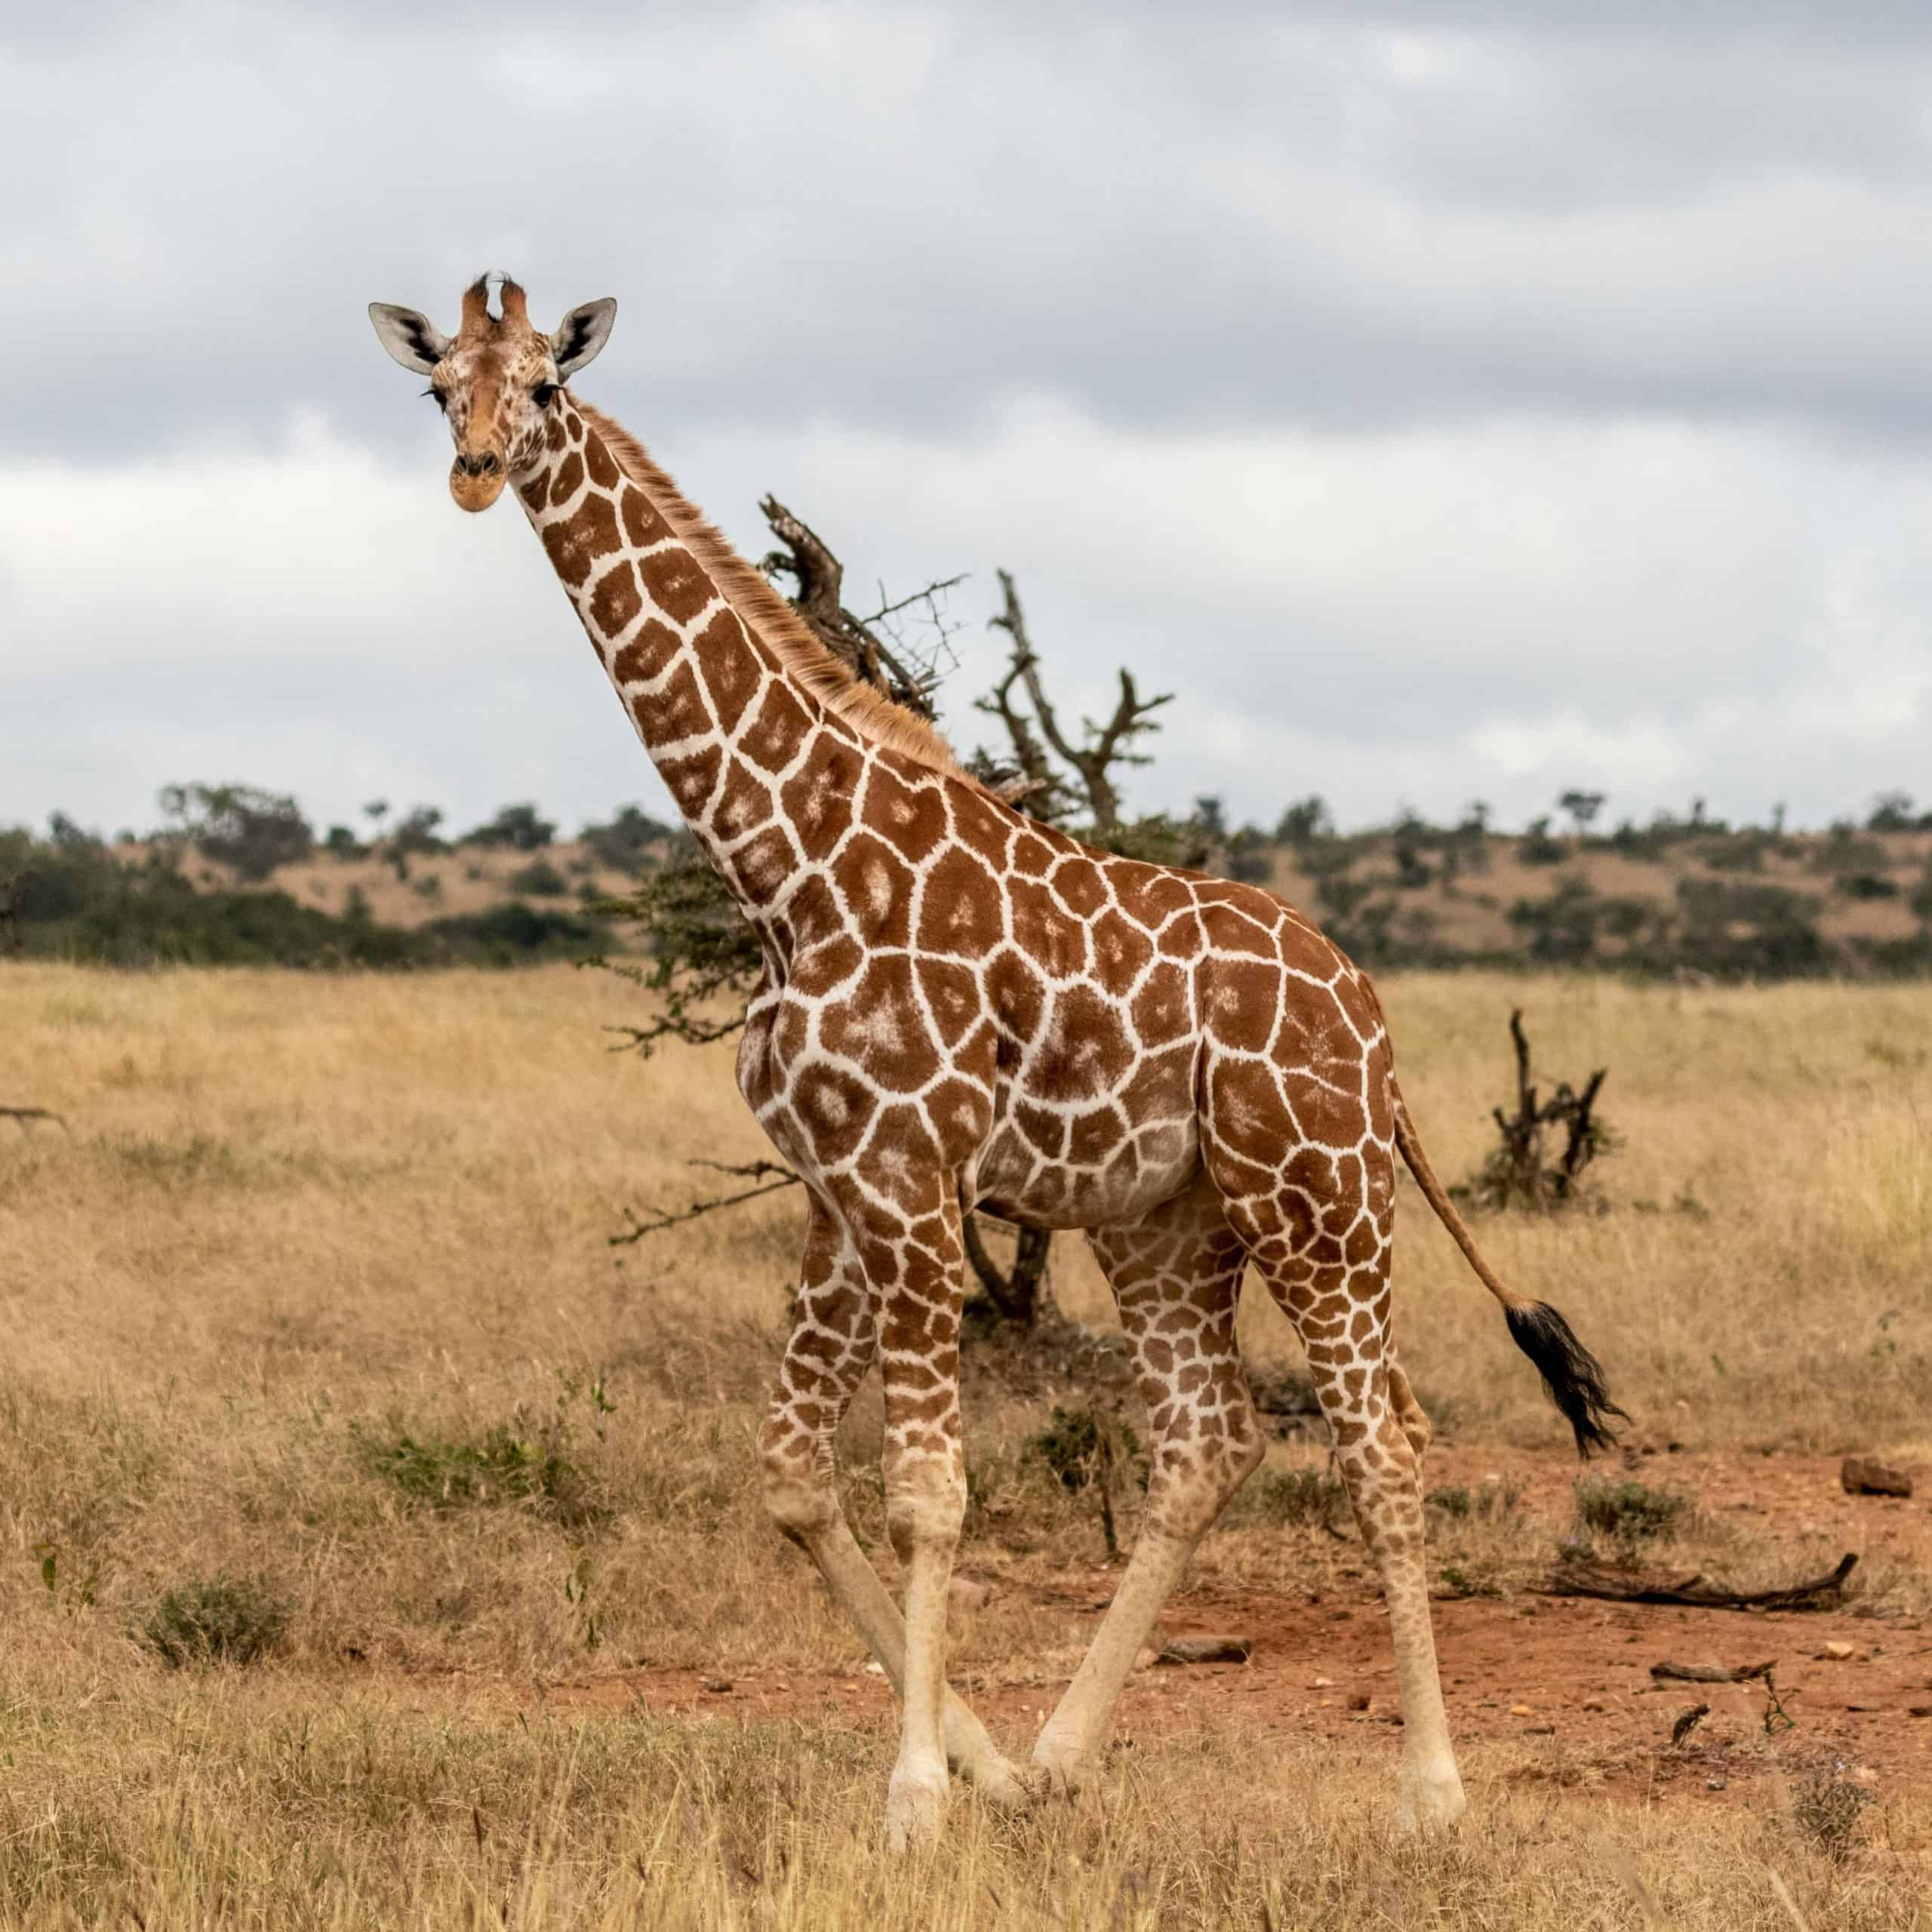 Reticulated Giraffe Jan 2020